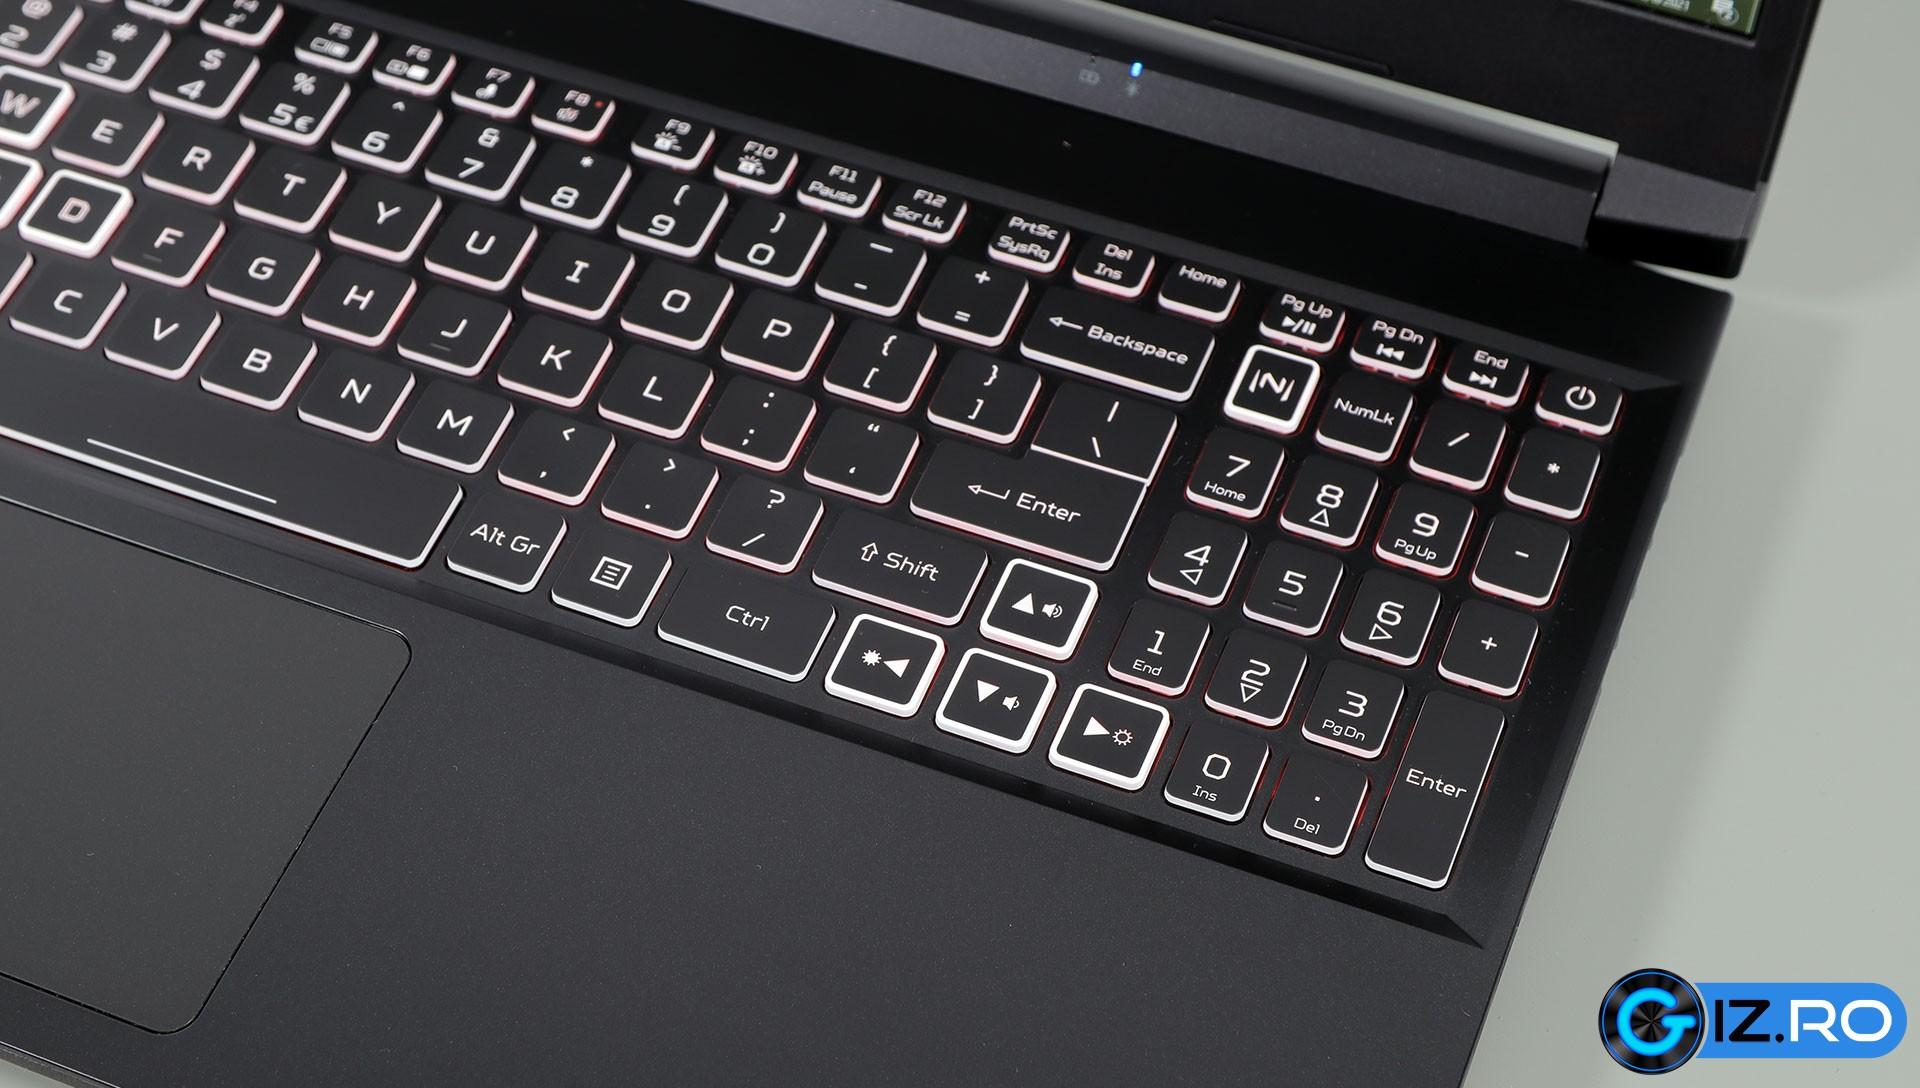 acer-nitro-5-2021-keyboard-arrows-numpad